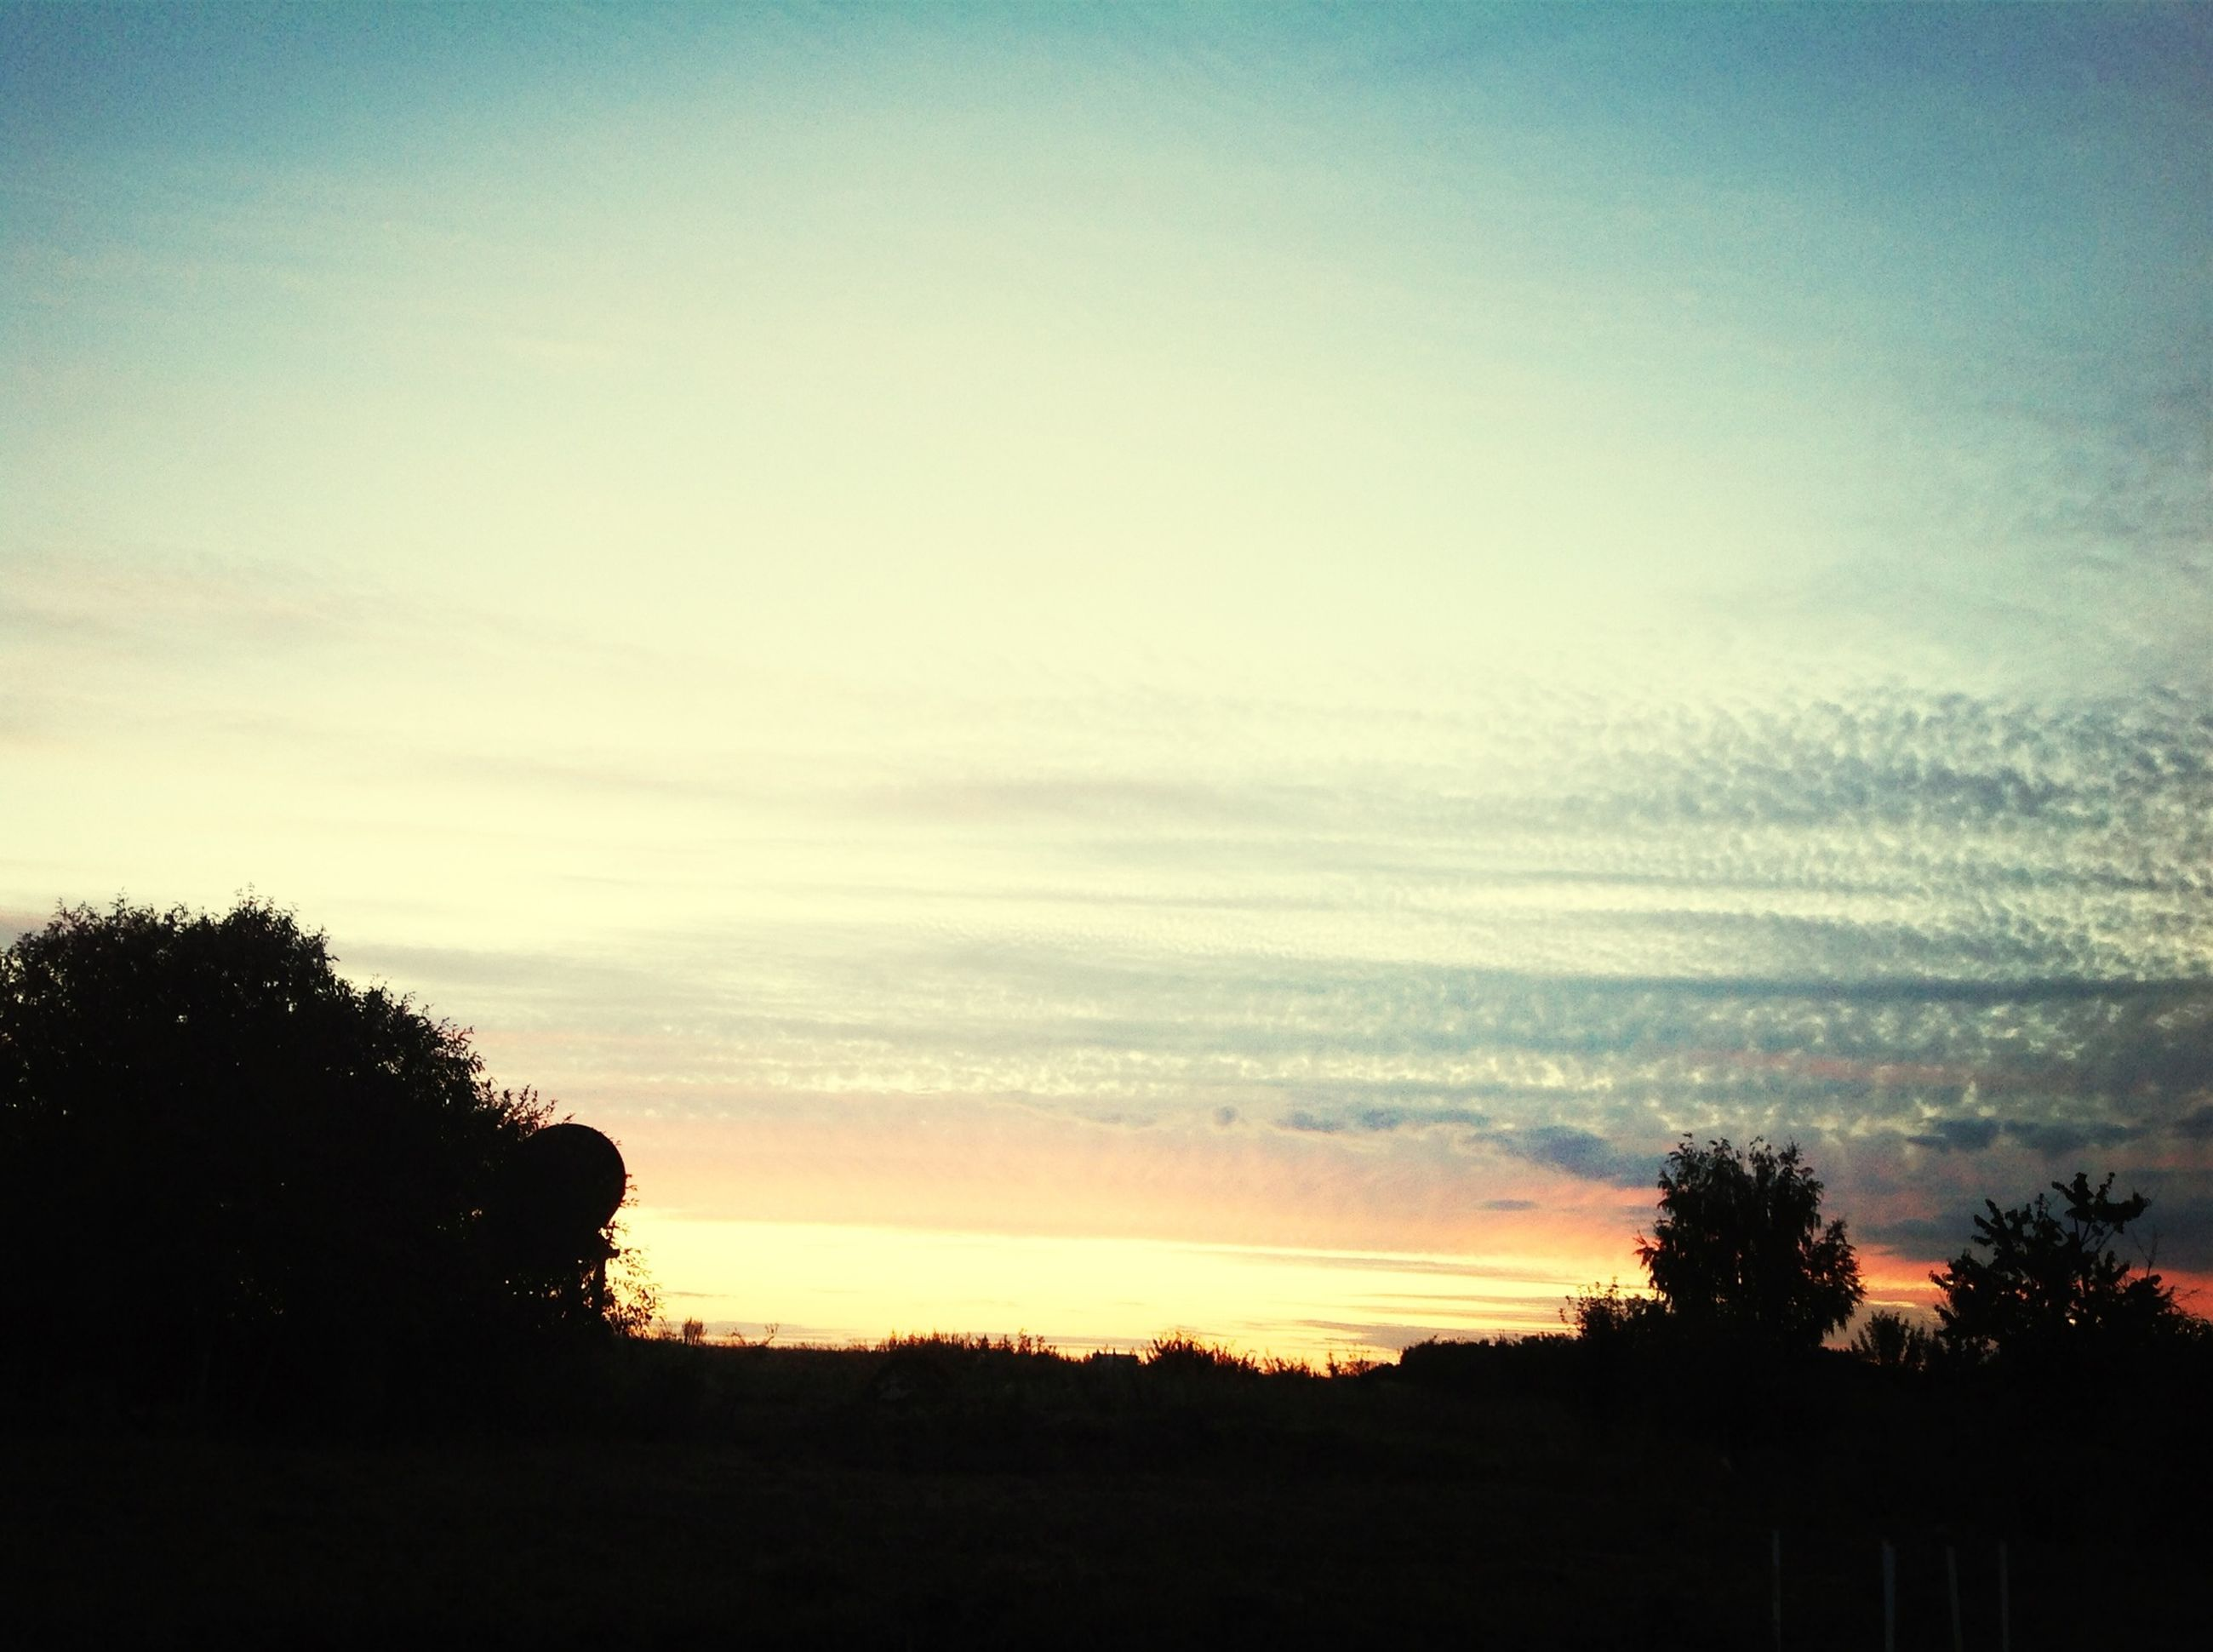 sunset, silhouette, tranquil scene, scenics, tree, tranquility, beauty in nature, sky, landscape, nature, idyllic, orange color, field, cloud - sky, outdoors, dusk, dark, non-urban scene, cloud, no people